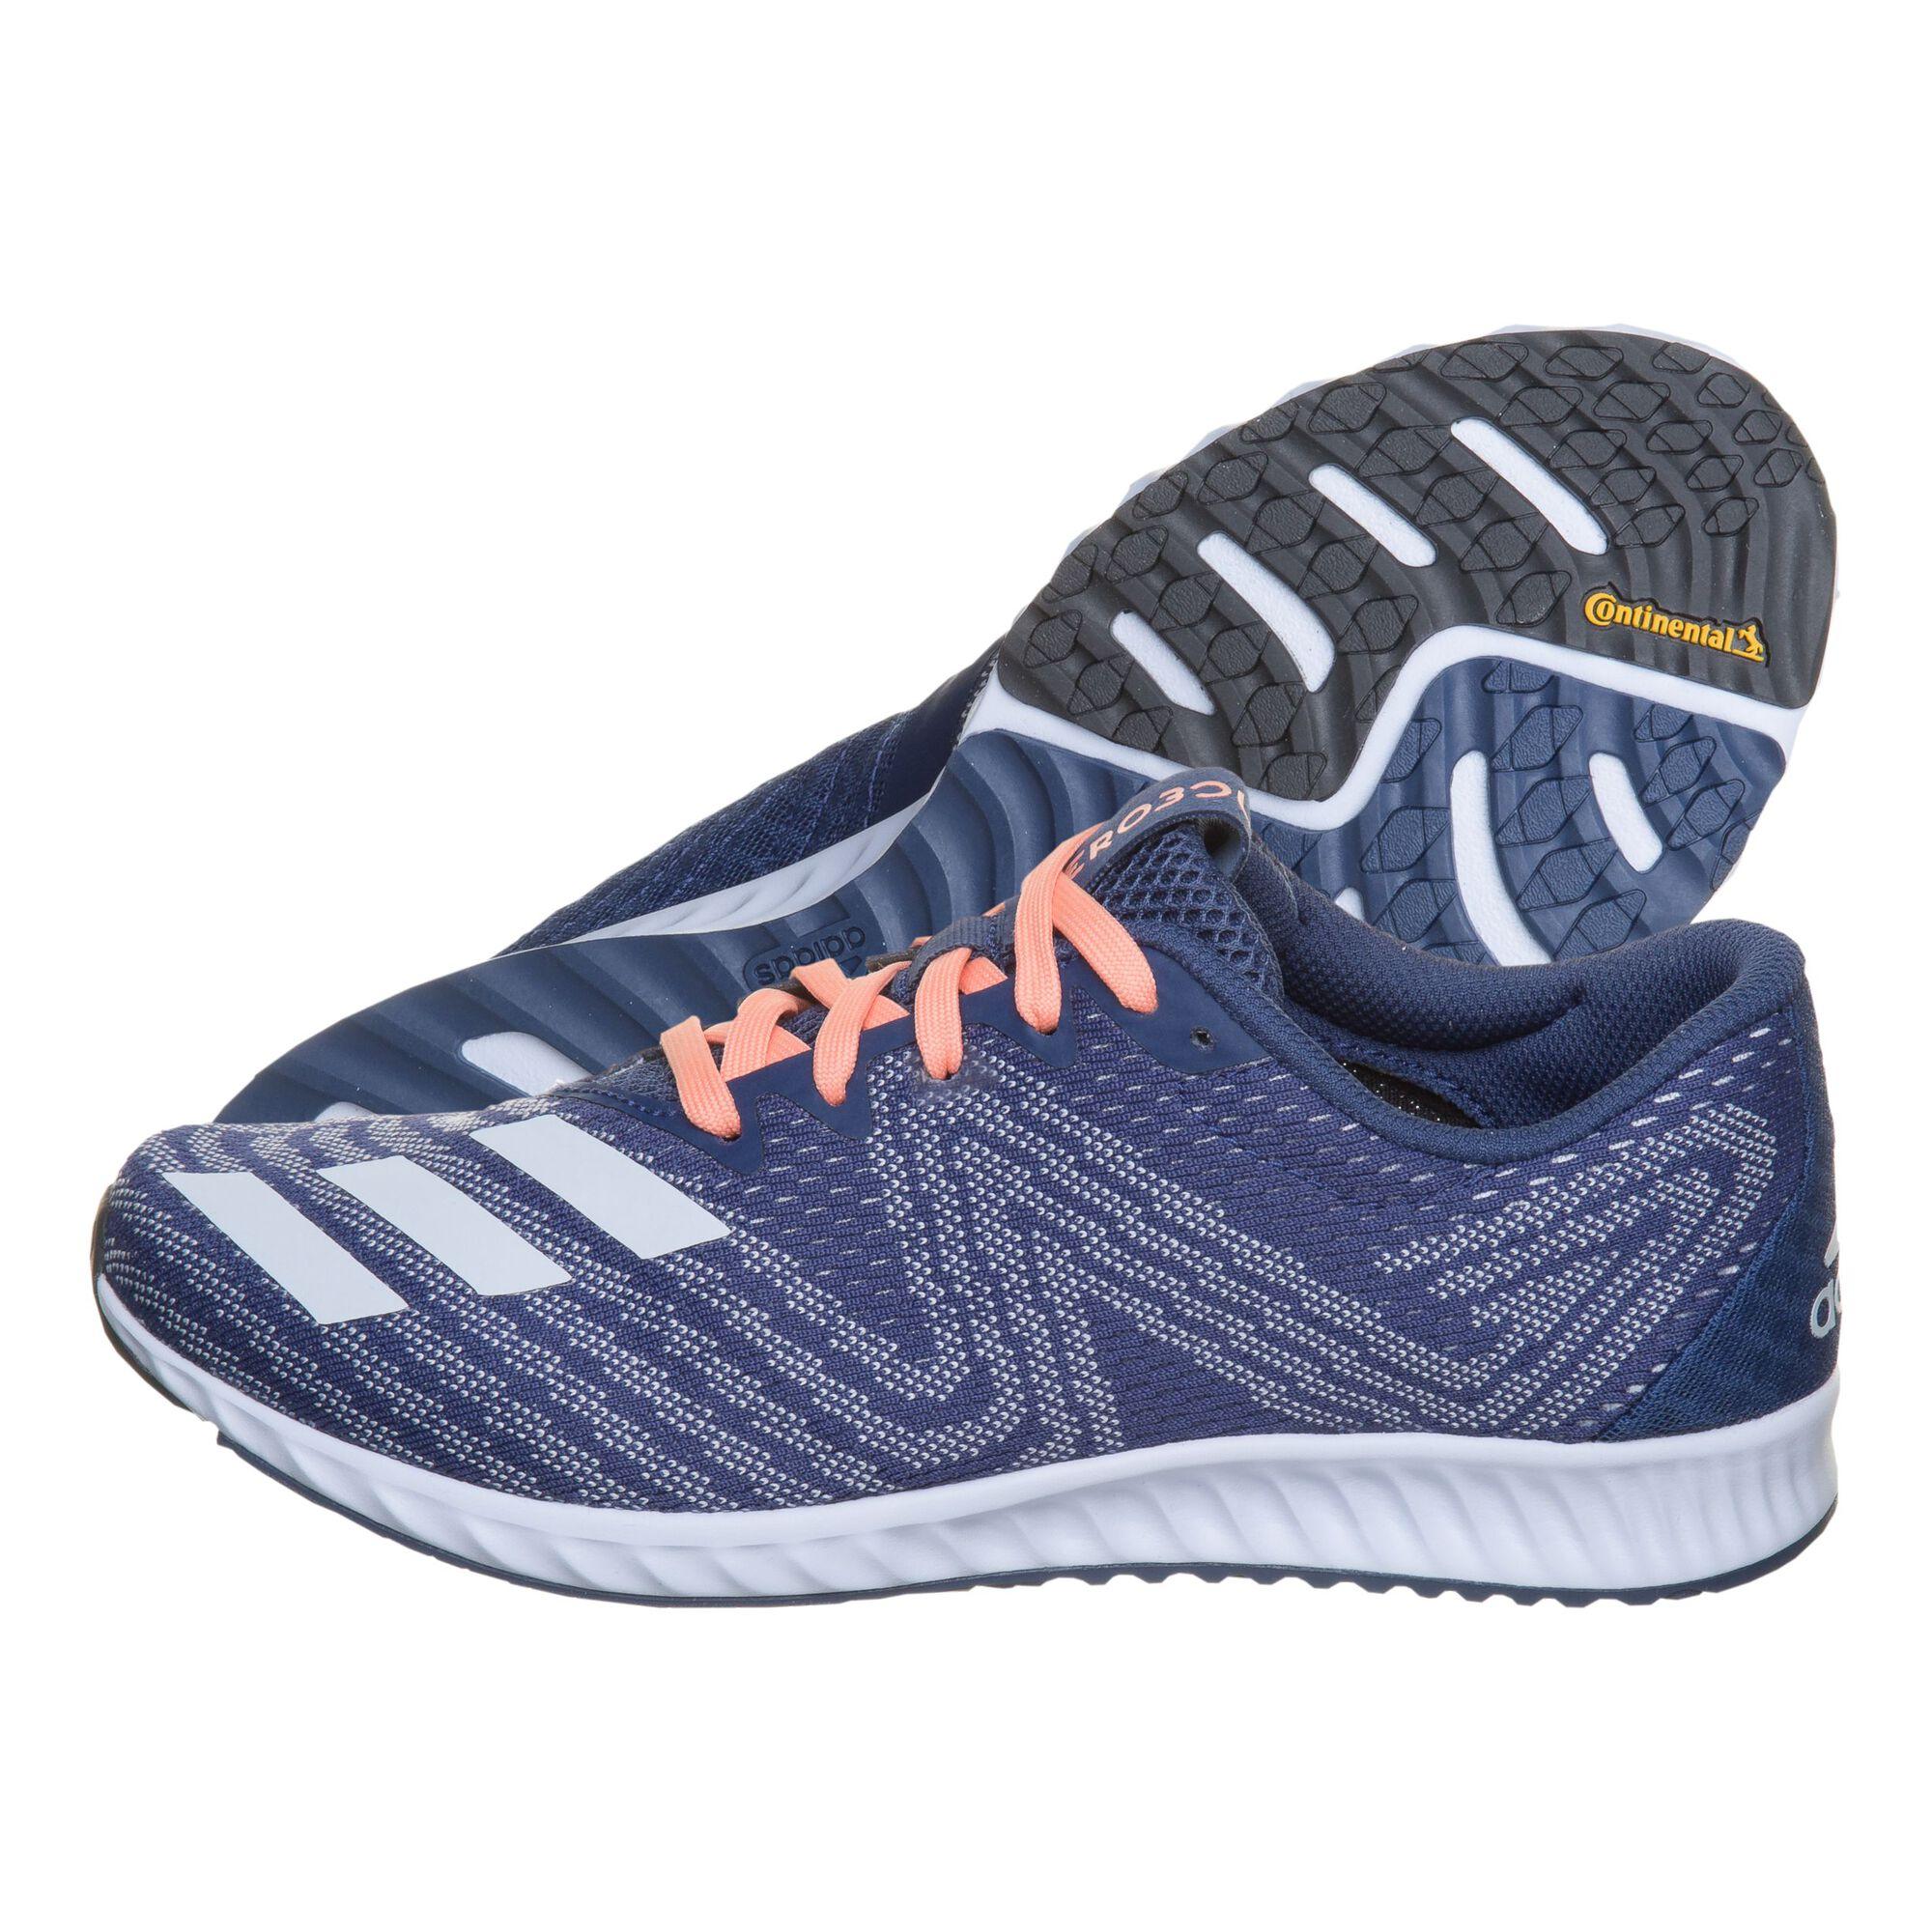 competitive price d17a4 7fca2 adidas · adidas · adidas · adidas · adidas ...